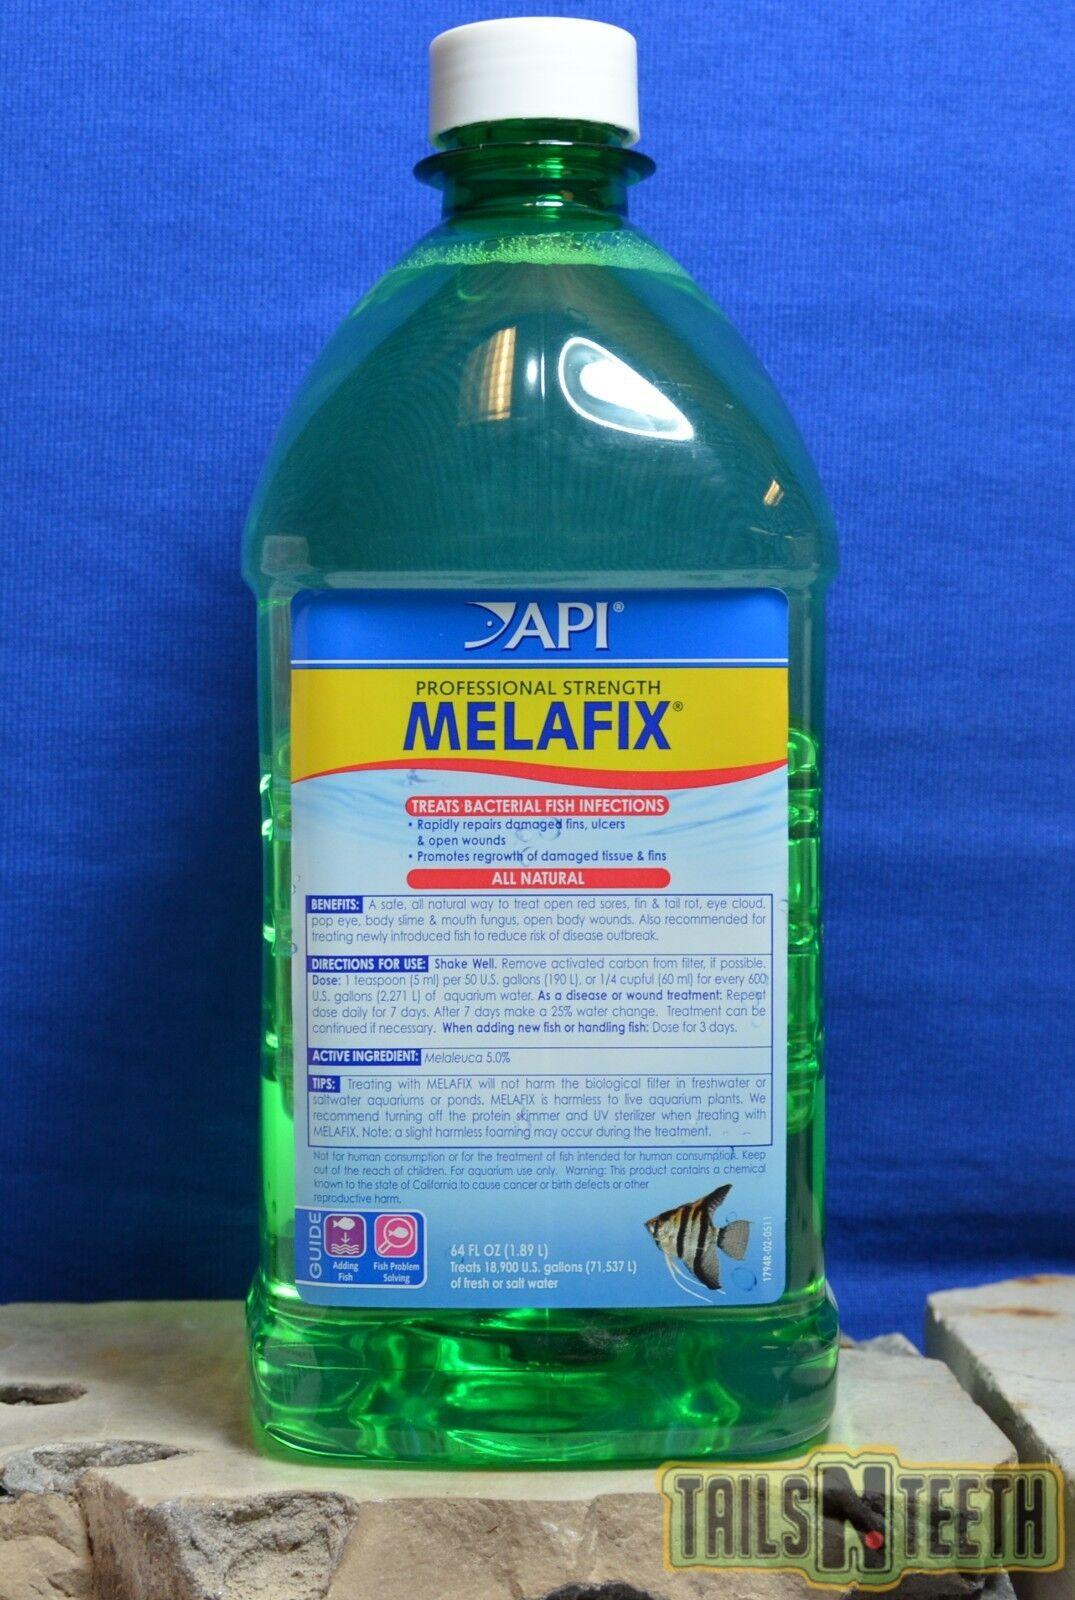 1 89L Melafix - API 5% Strength Professional - Infections